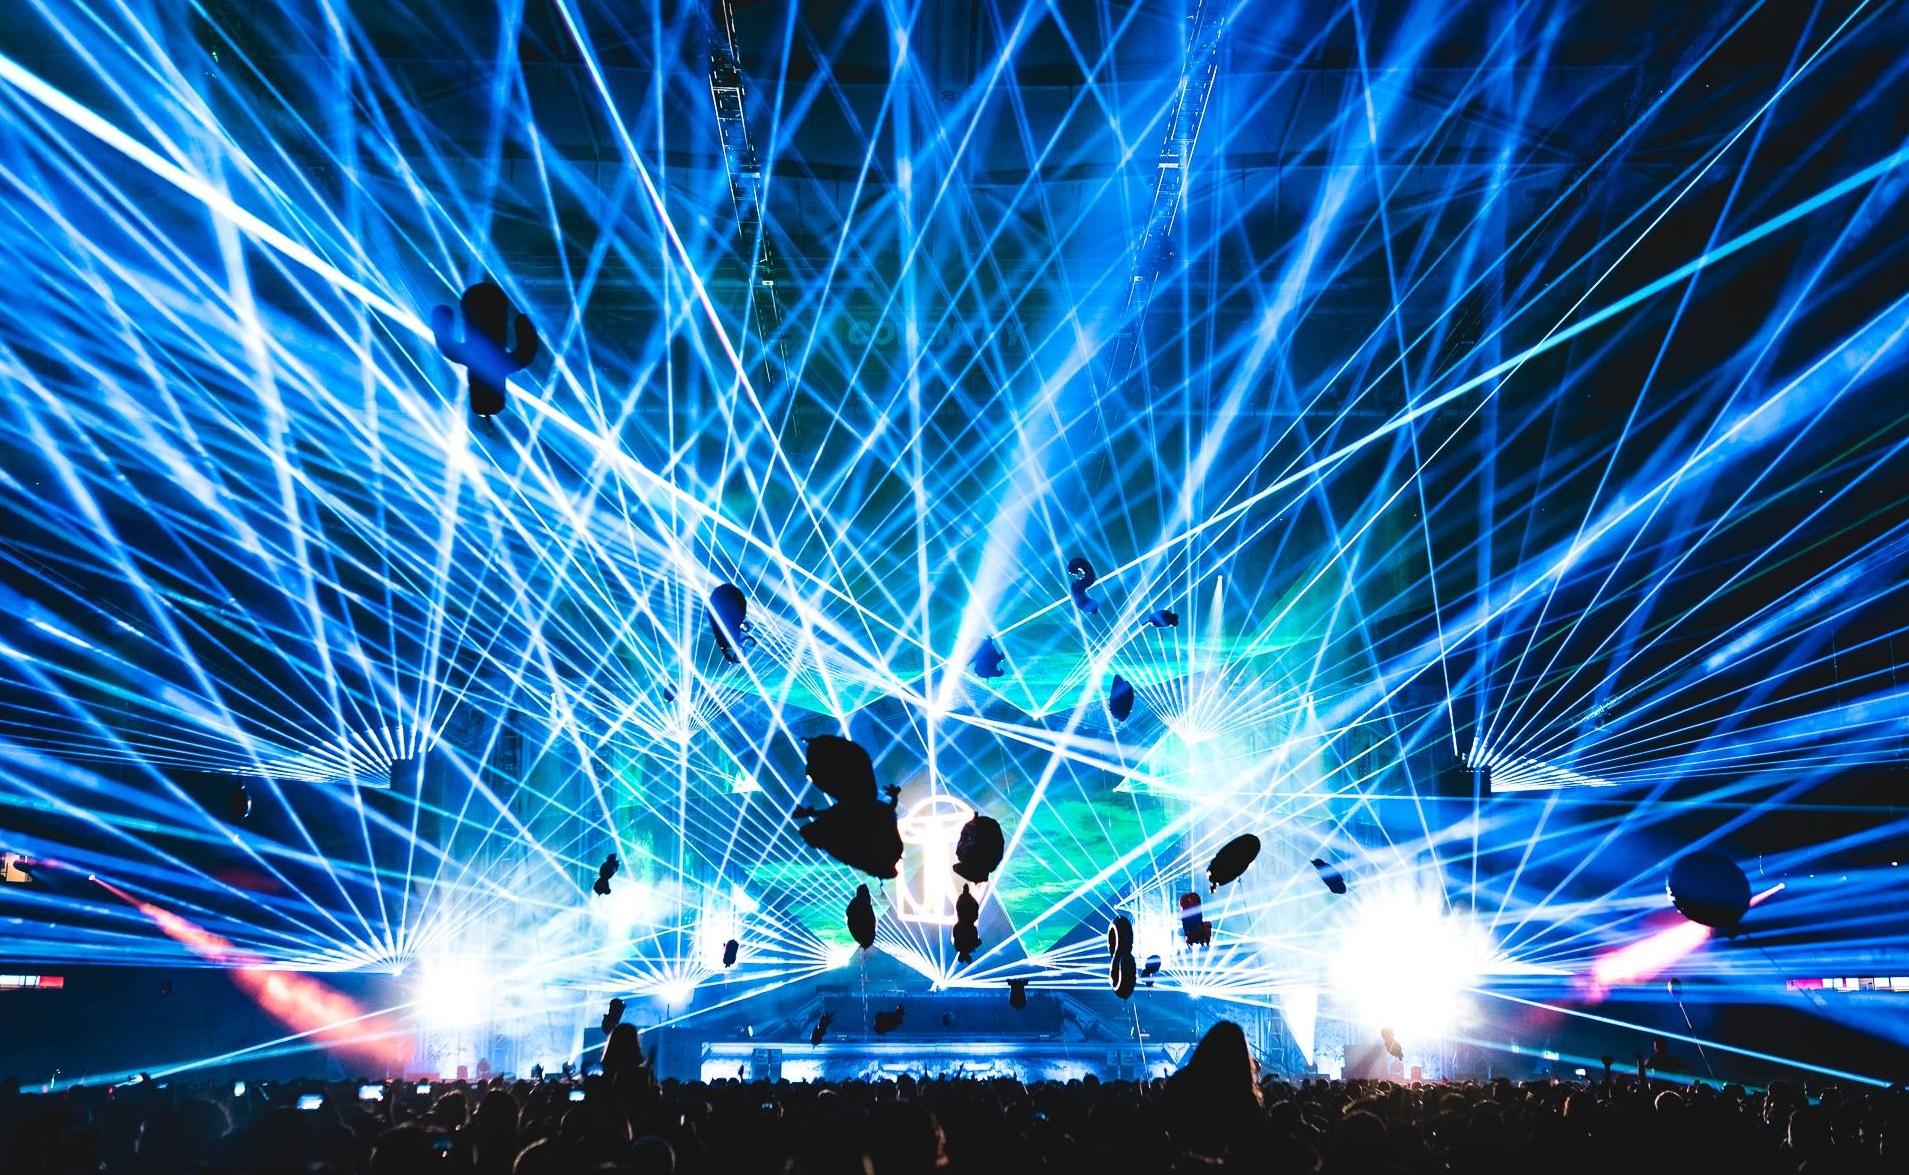 Transmission 2017 Etihad Stadium lasers